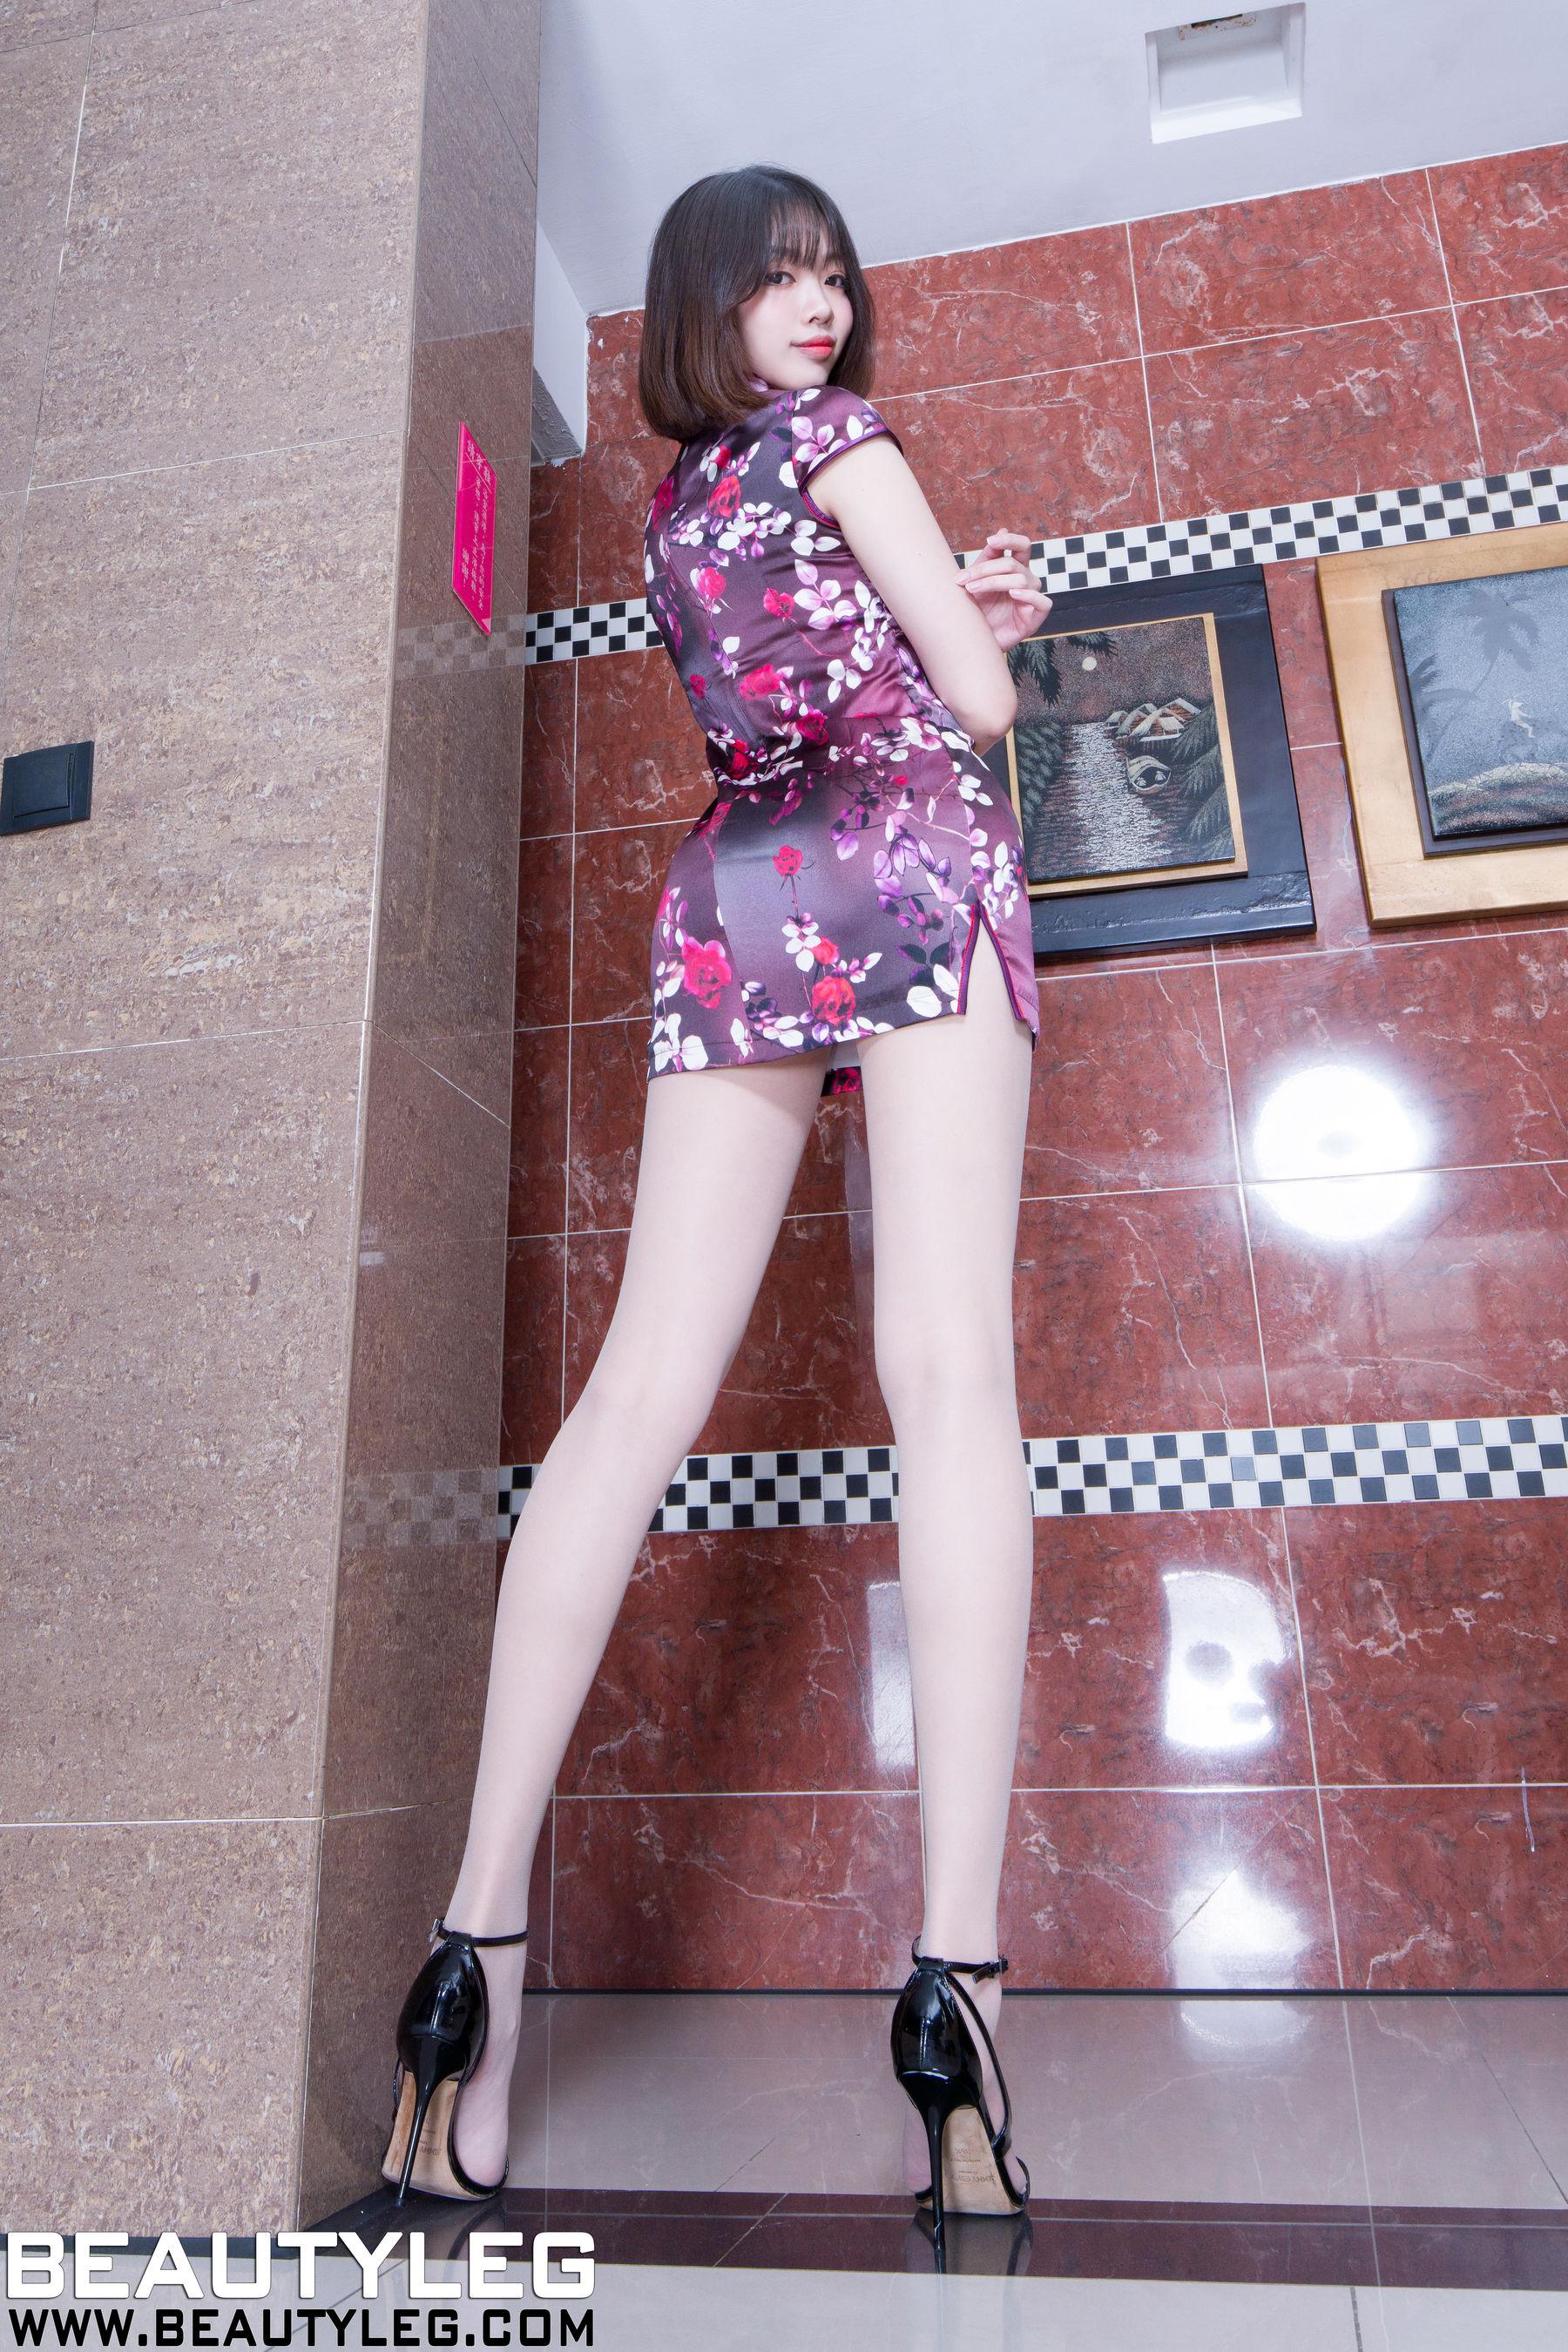 VOL.612 [Beautyleg]丝袜美腿高跟:腿模Joanna超高清个人性感漂亮大图(64P)